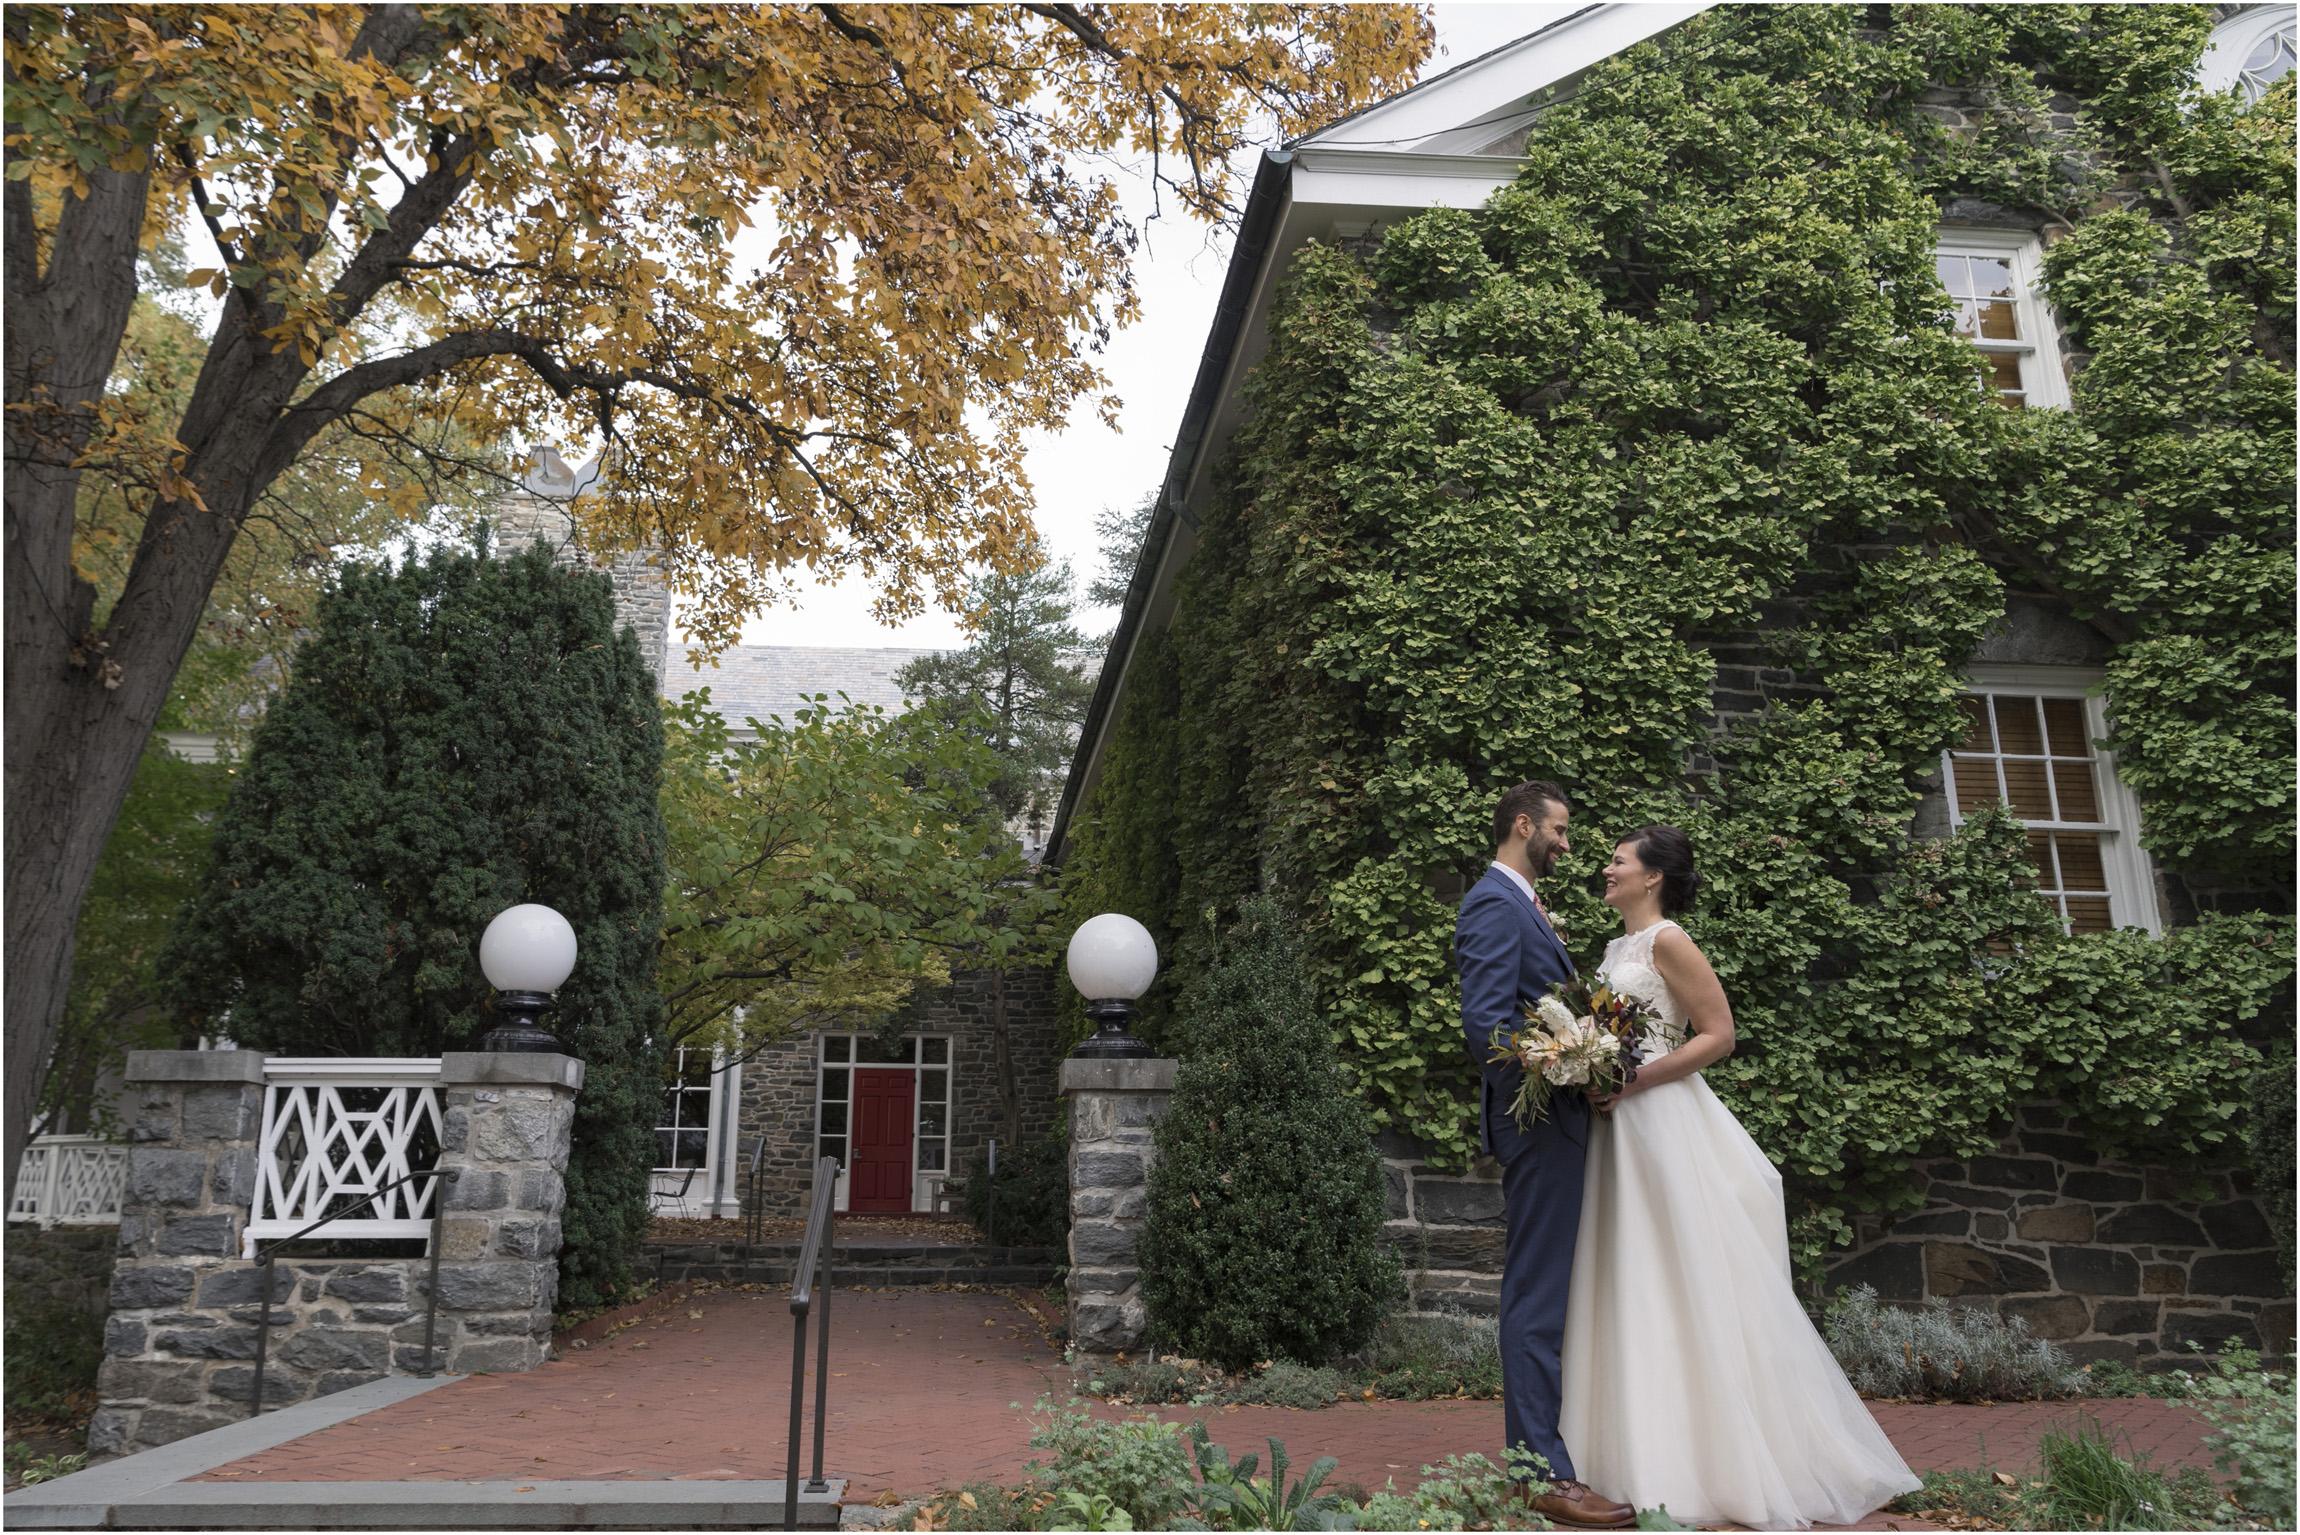 ©FianderFoto_Melissa_Mark_Wedding_Maryland_018.jpg